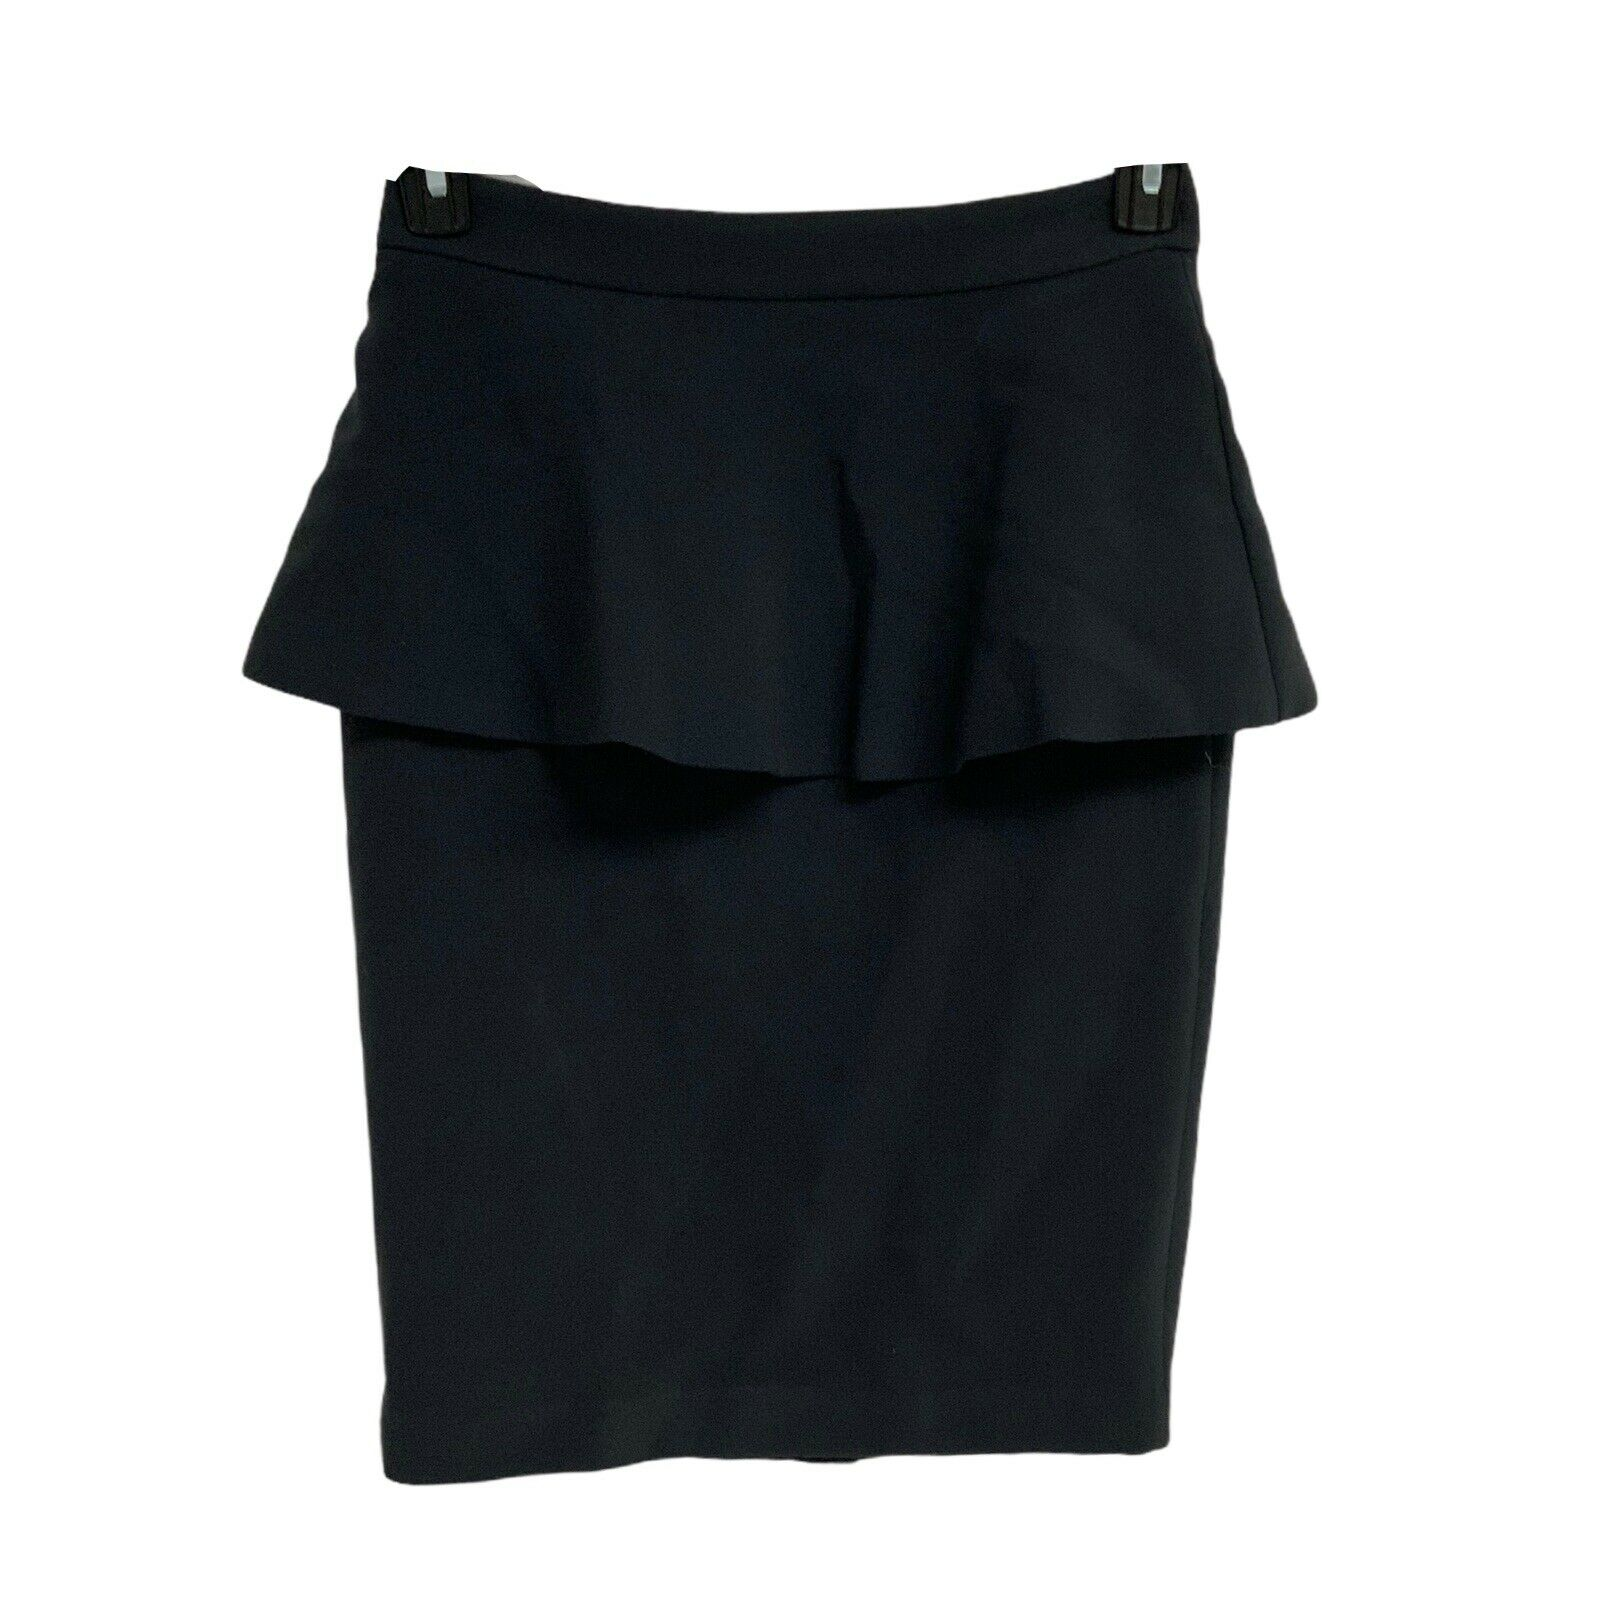 MNG Suit Ladies Peplum Skirt Knee Length Grey Size 6